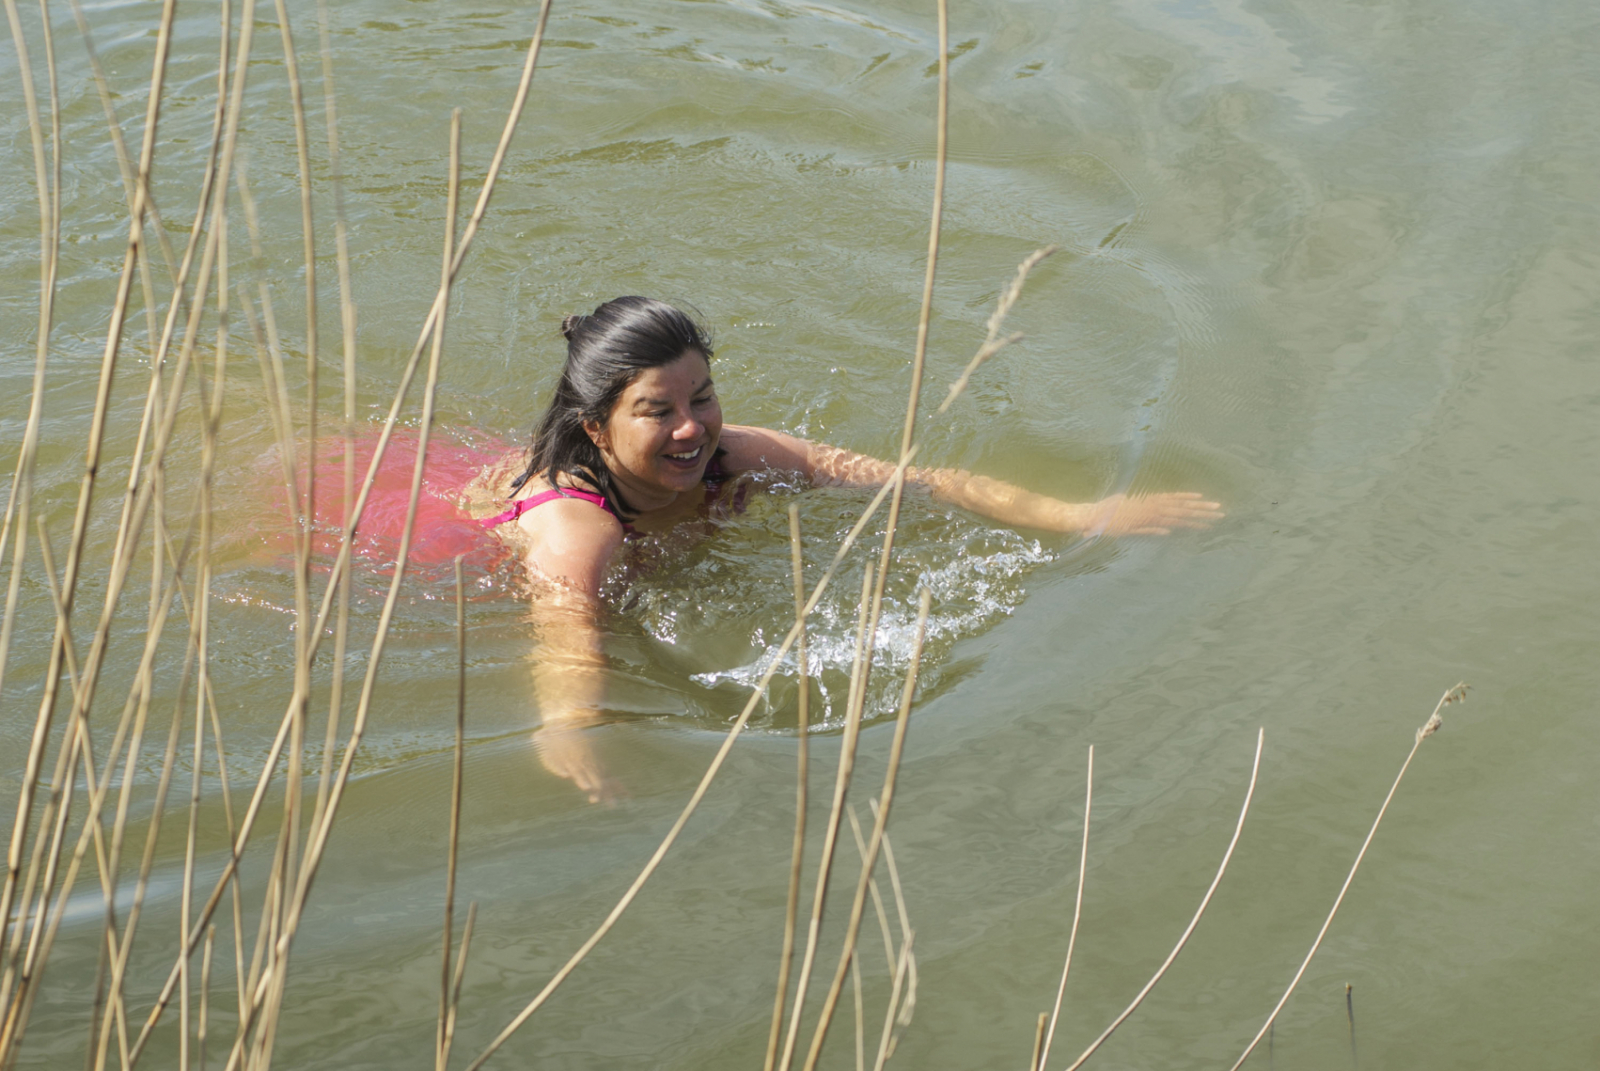 natuurzwemmen